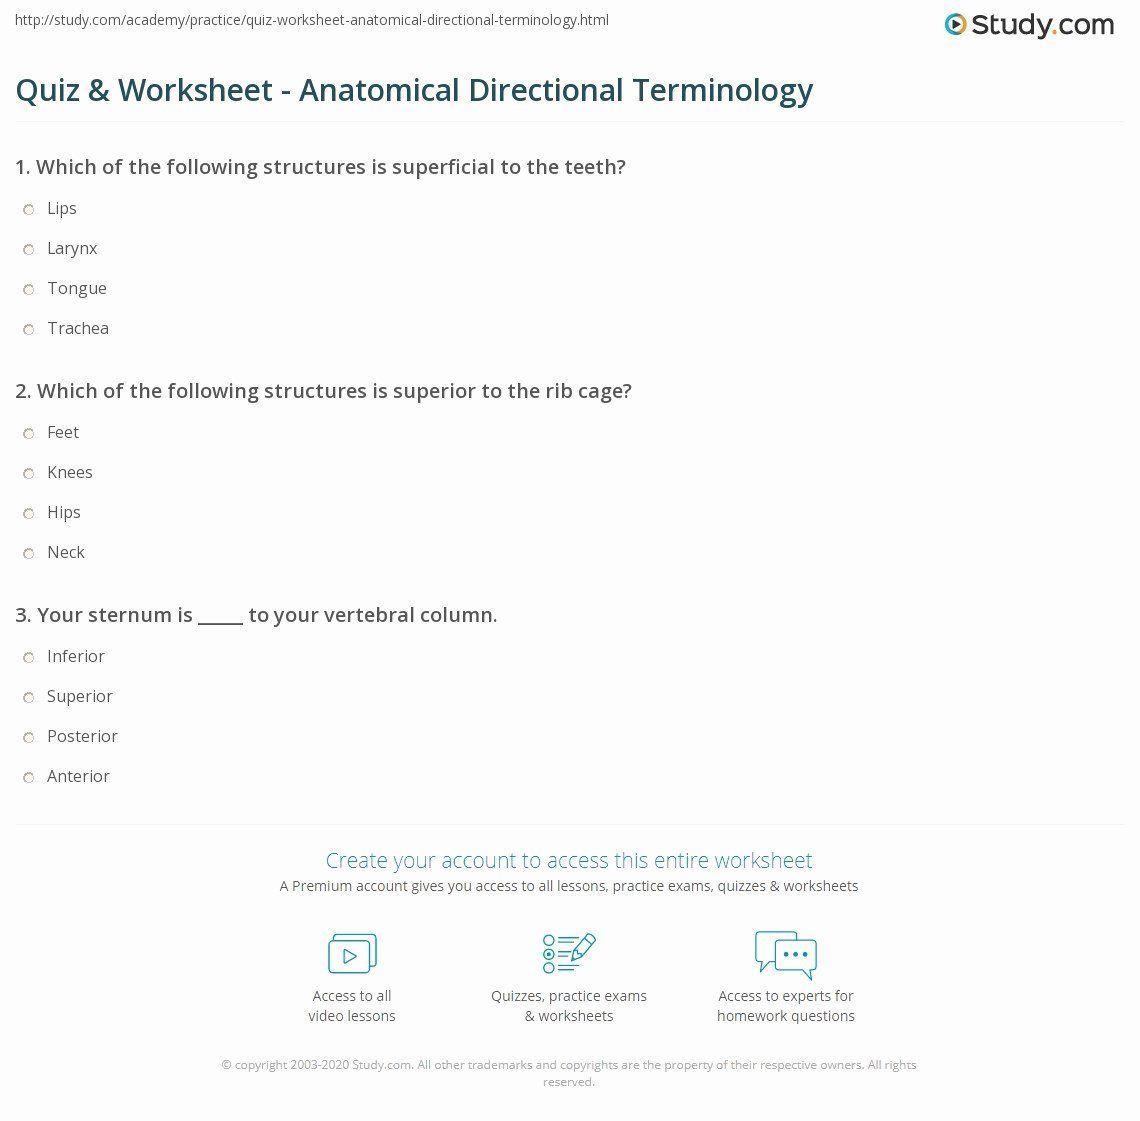 Anatomical Terms Worksheet Answers Elegant Quiz